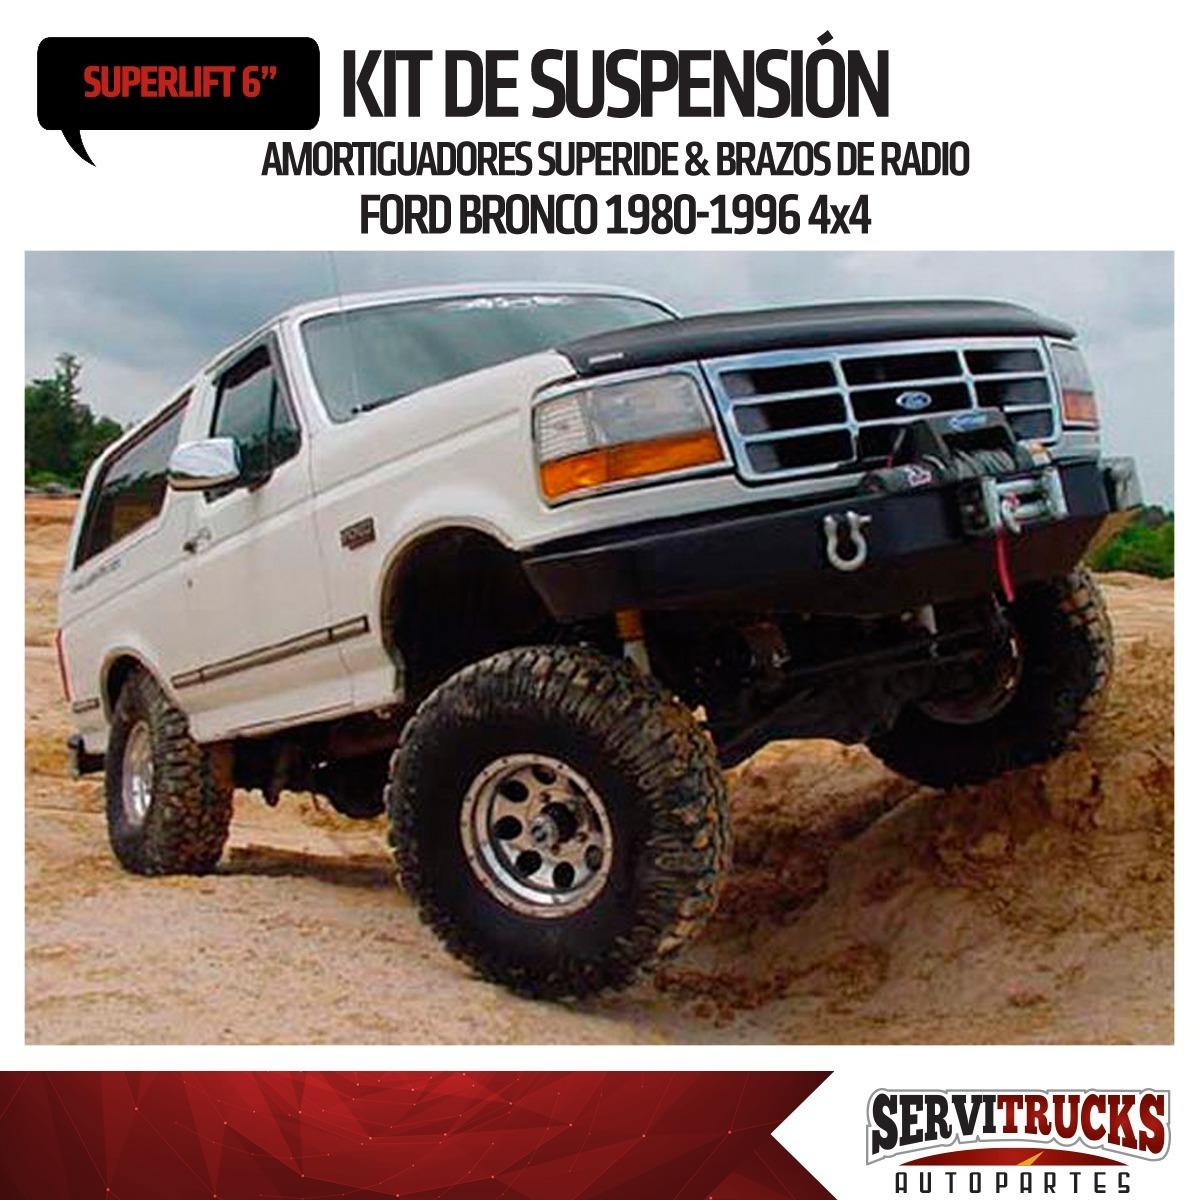 Kit De Suspension 6p Ford Bronco 4x4 1980 1996 Superlift - Bs. 3.960 ...